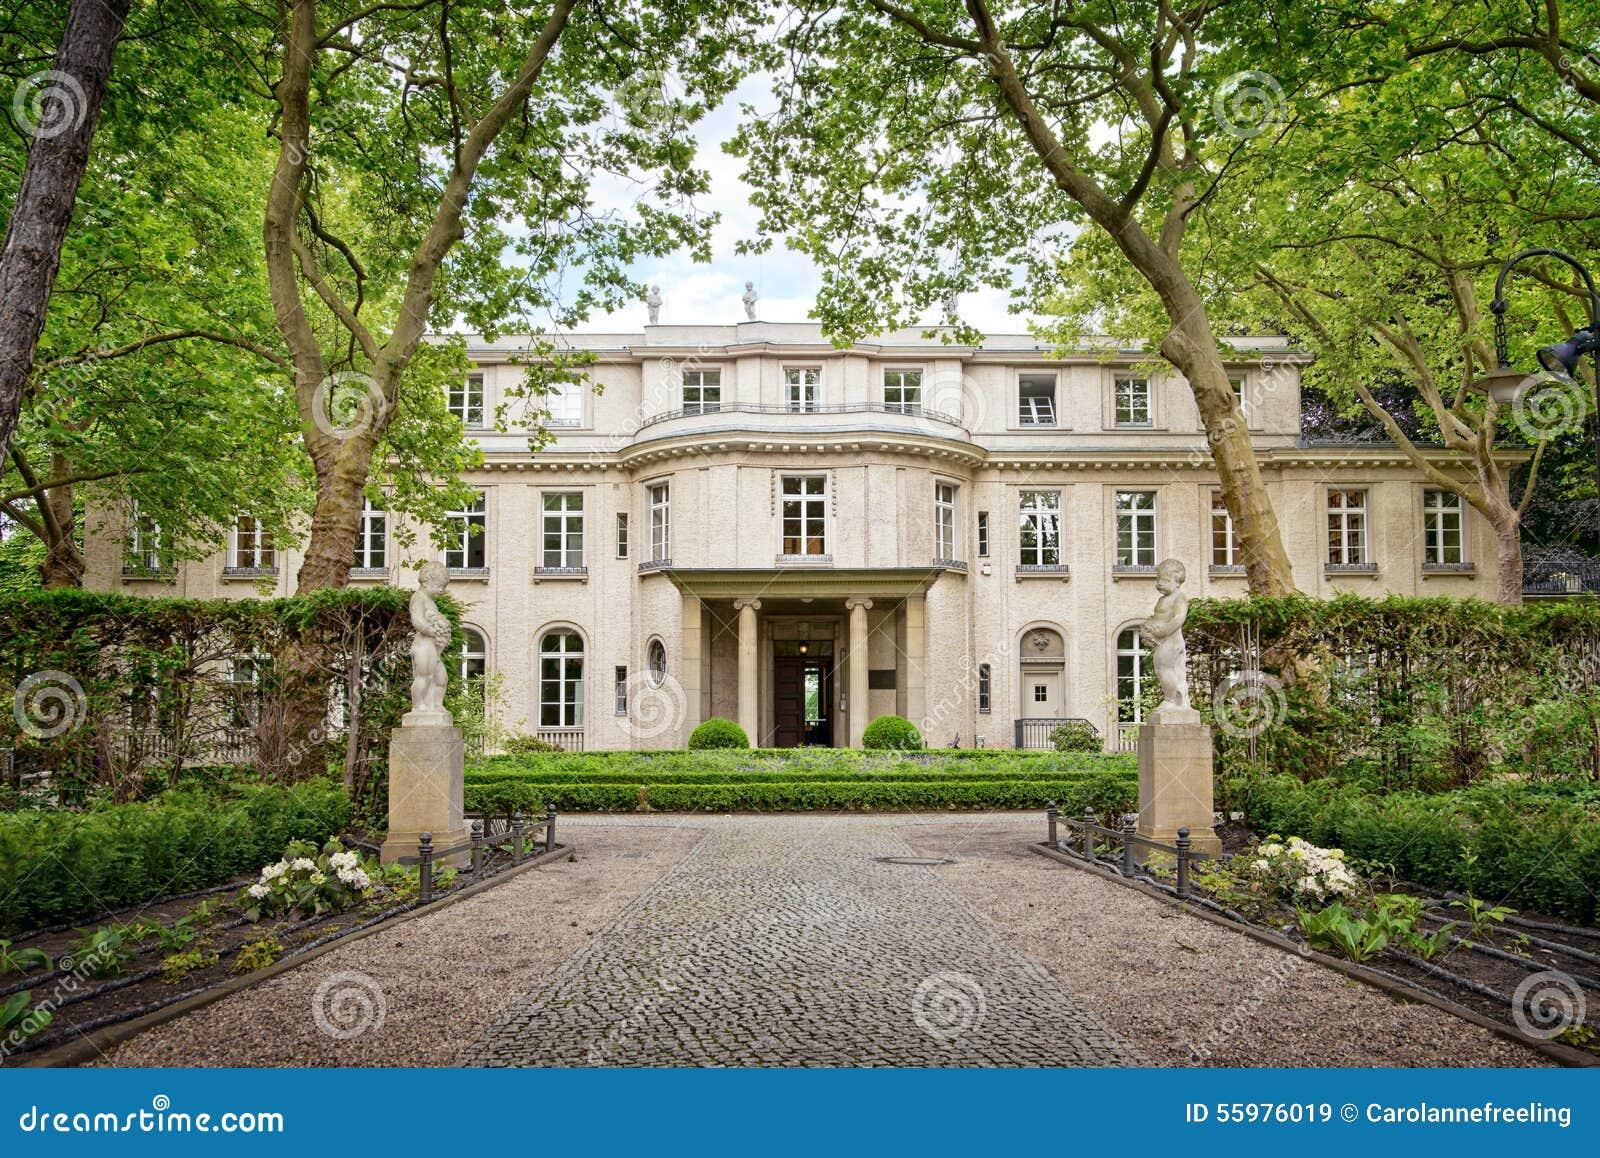 Casa da conferência de Wannsee em Berlim, Alemanha